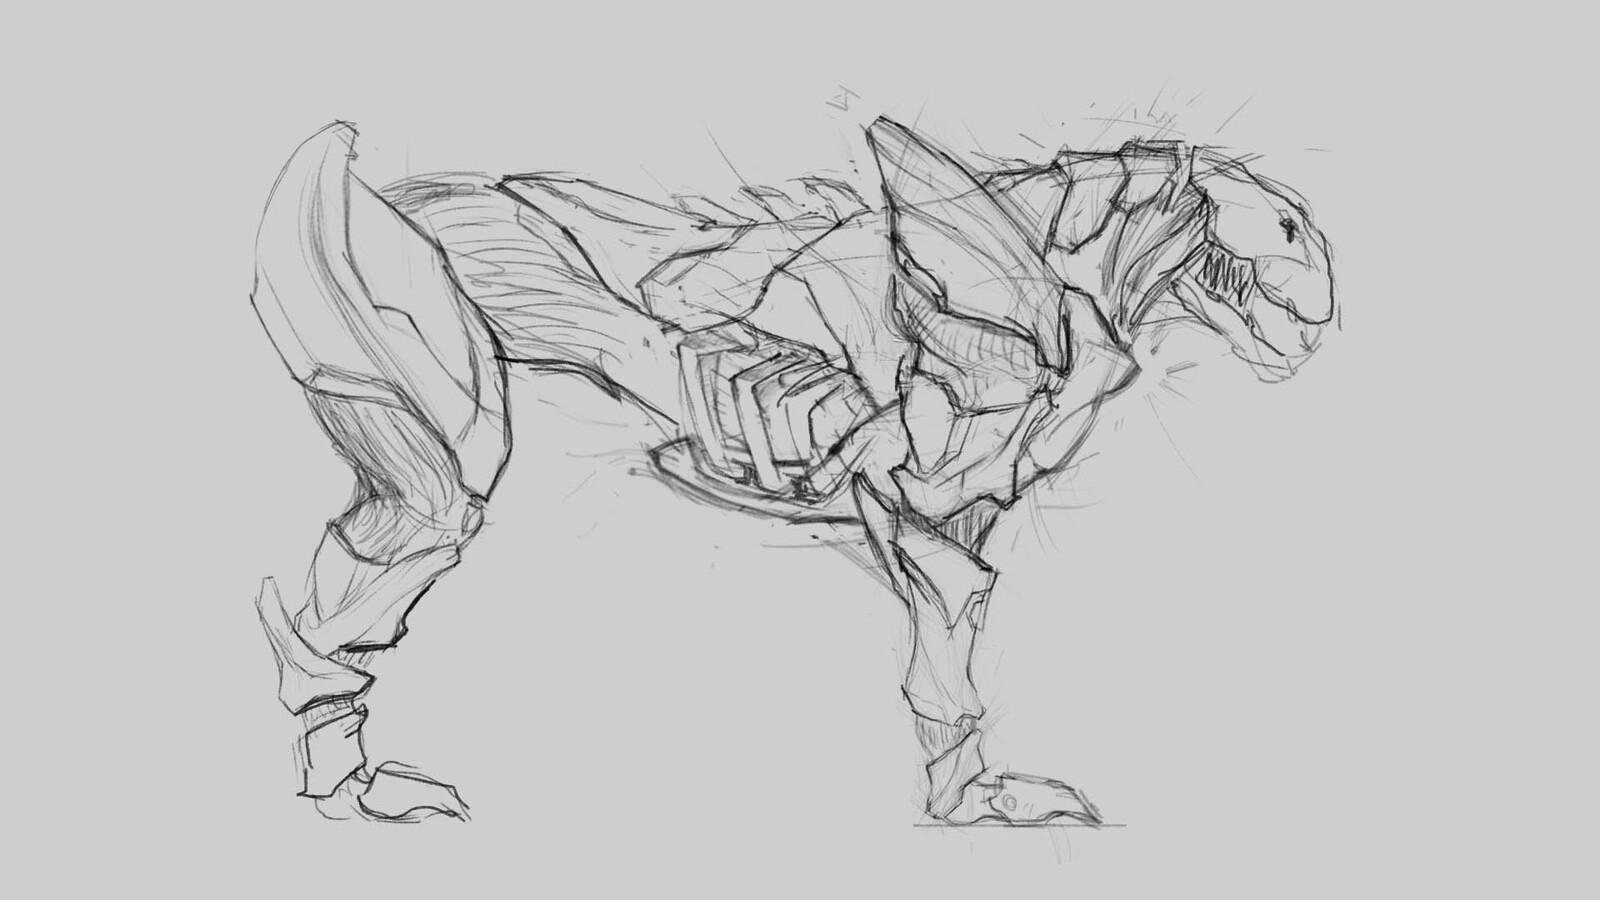 Refining shapes a bit.